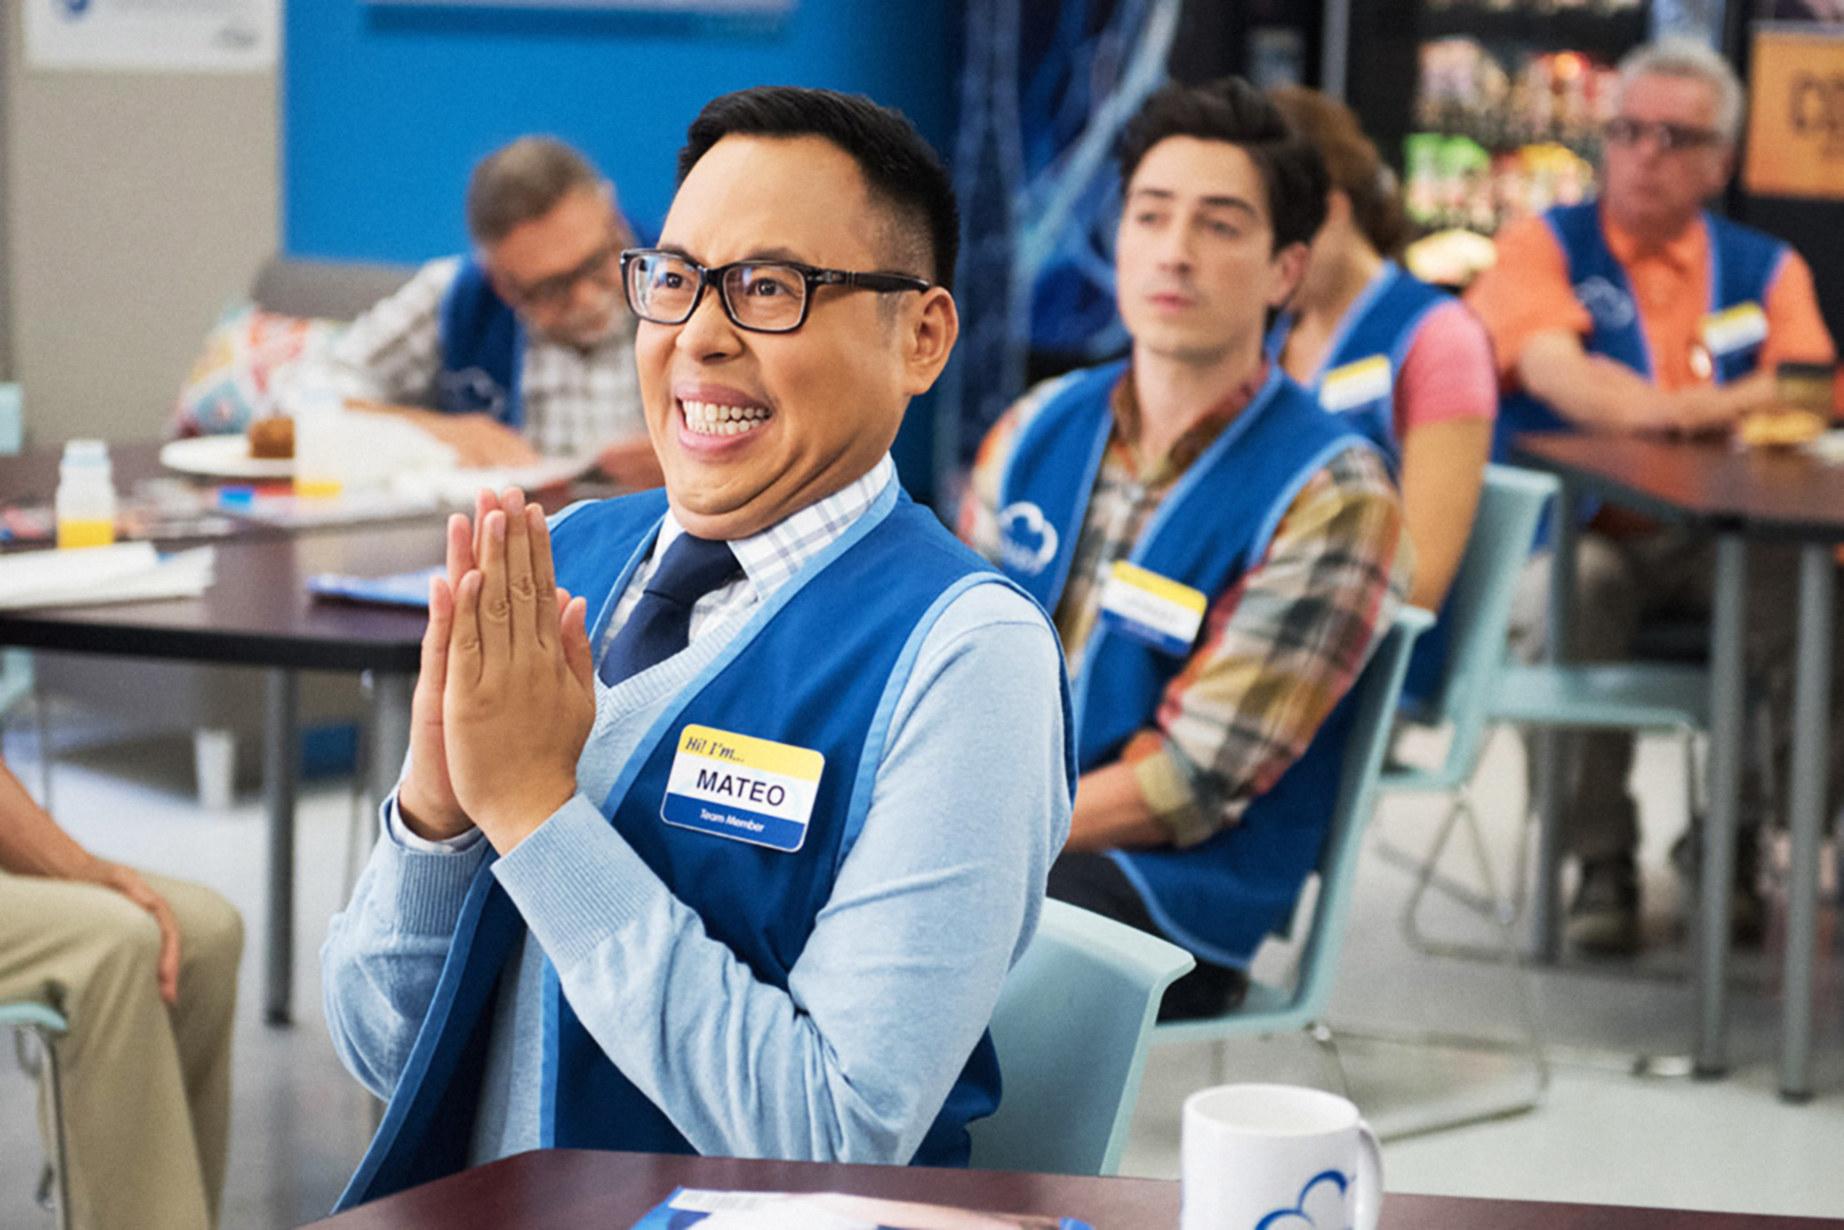 Nico Santos claps in the breakroom